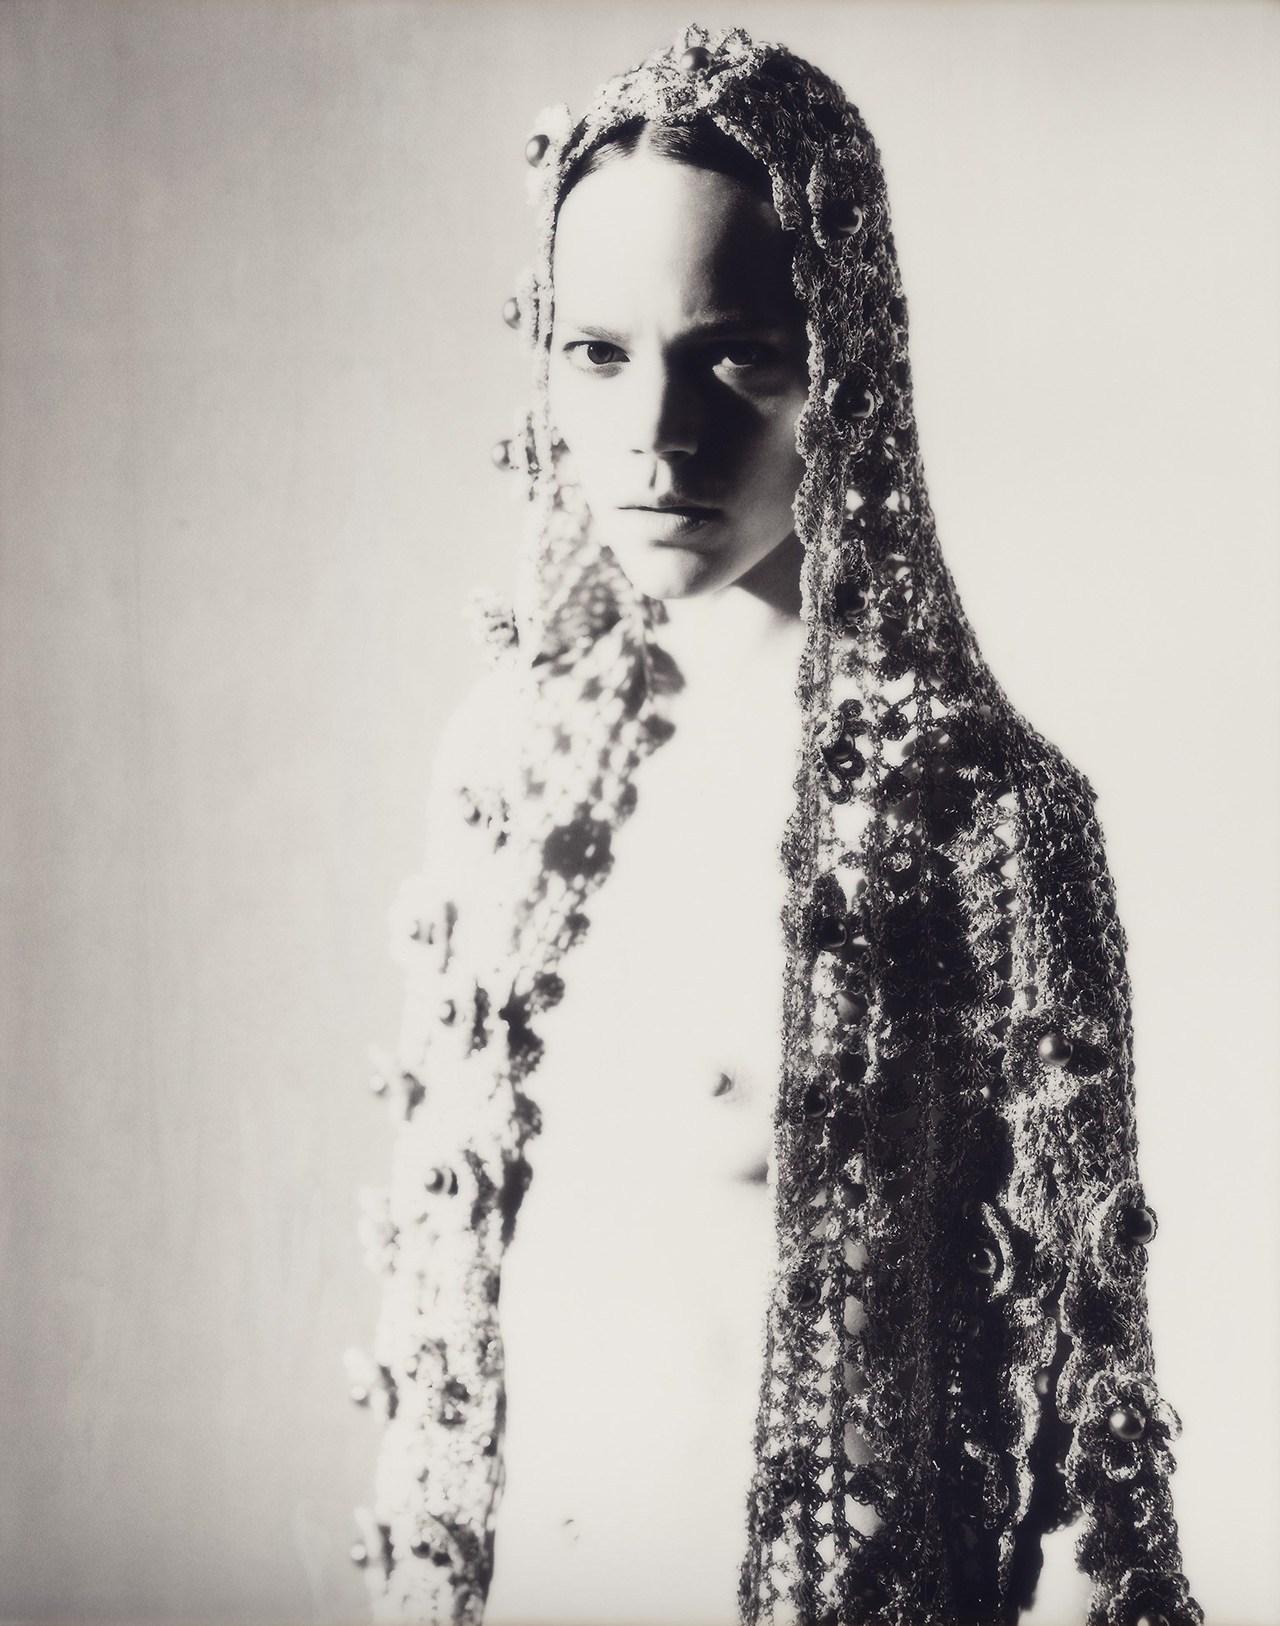 Freja_Beha_Erichsen-Richard_Bush-Document_Journal-04-portraitsofgirls.jpg